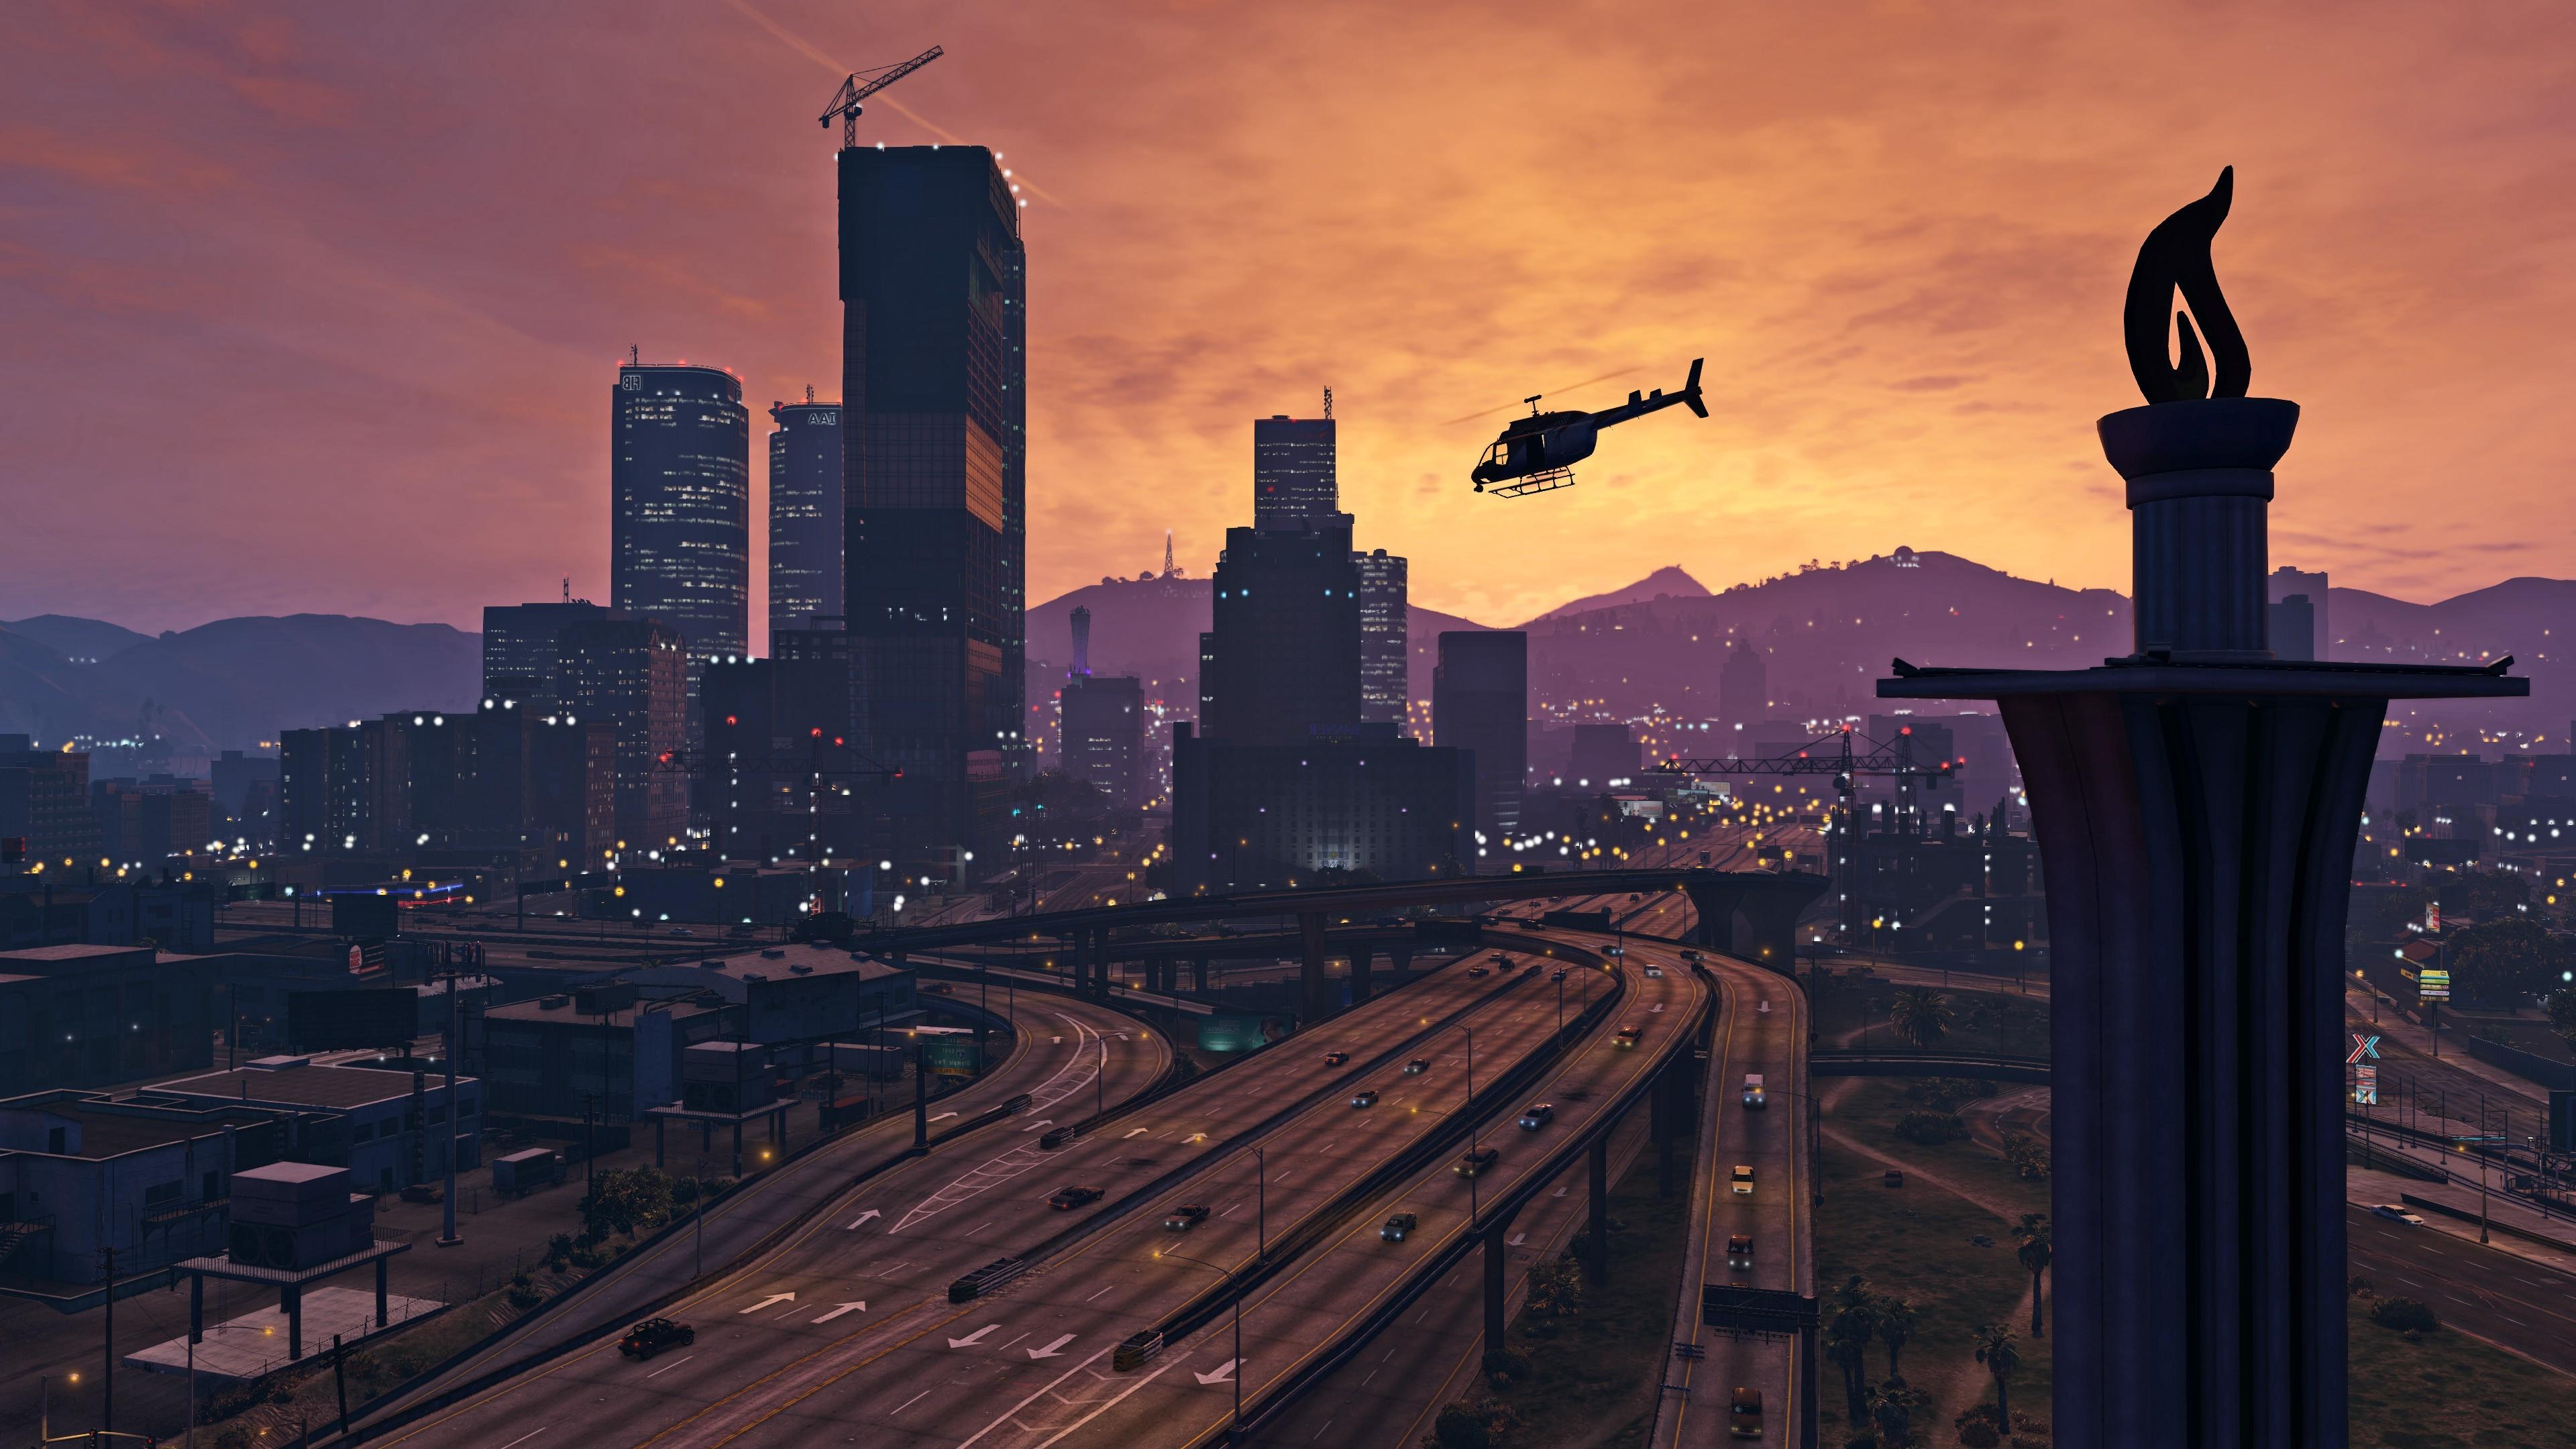 Wallpaper Video Games Sunset City Cityscape Night Sky Sunrise Skyline Skyscraper Evening Morning Tower Horizon Grand Theft Auto V PC Gaming